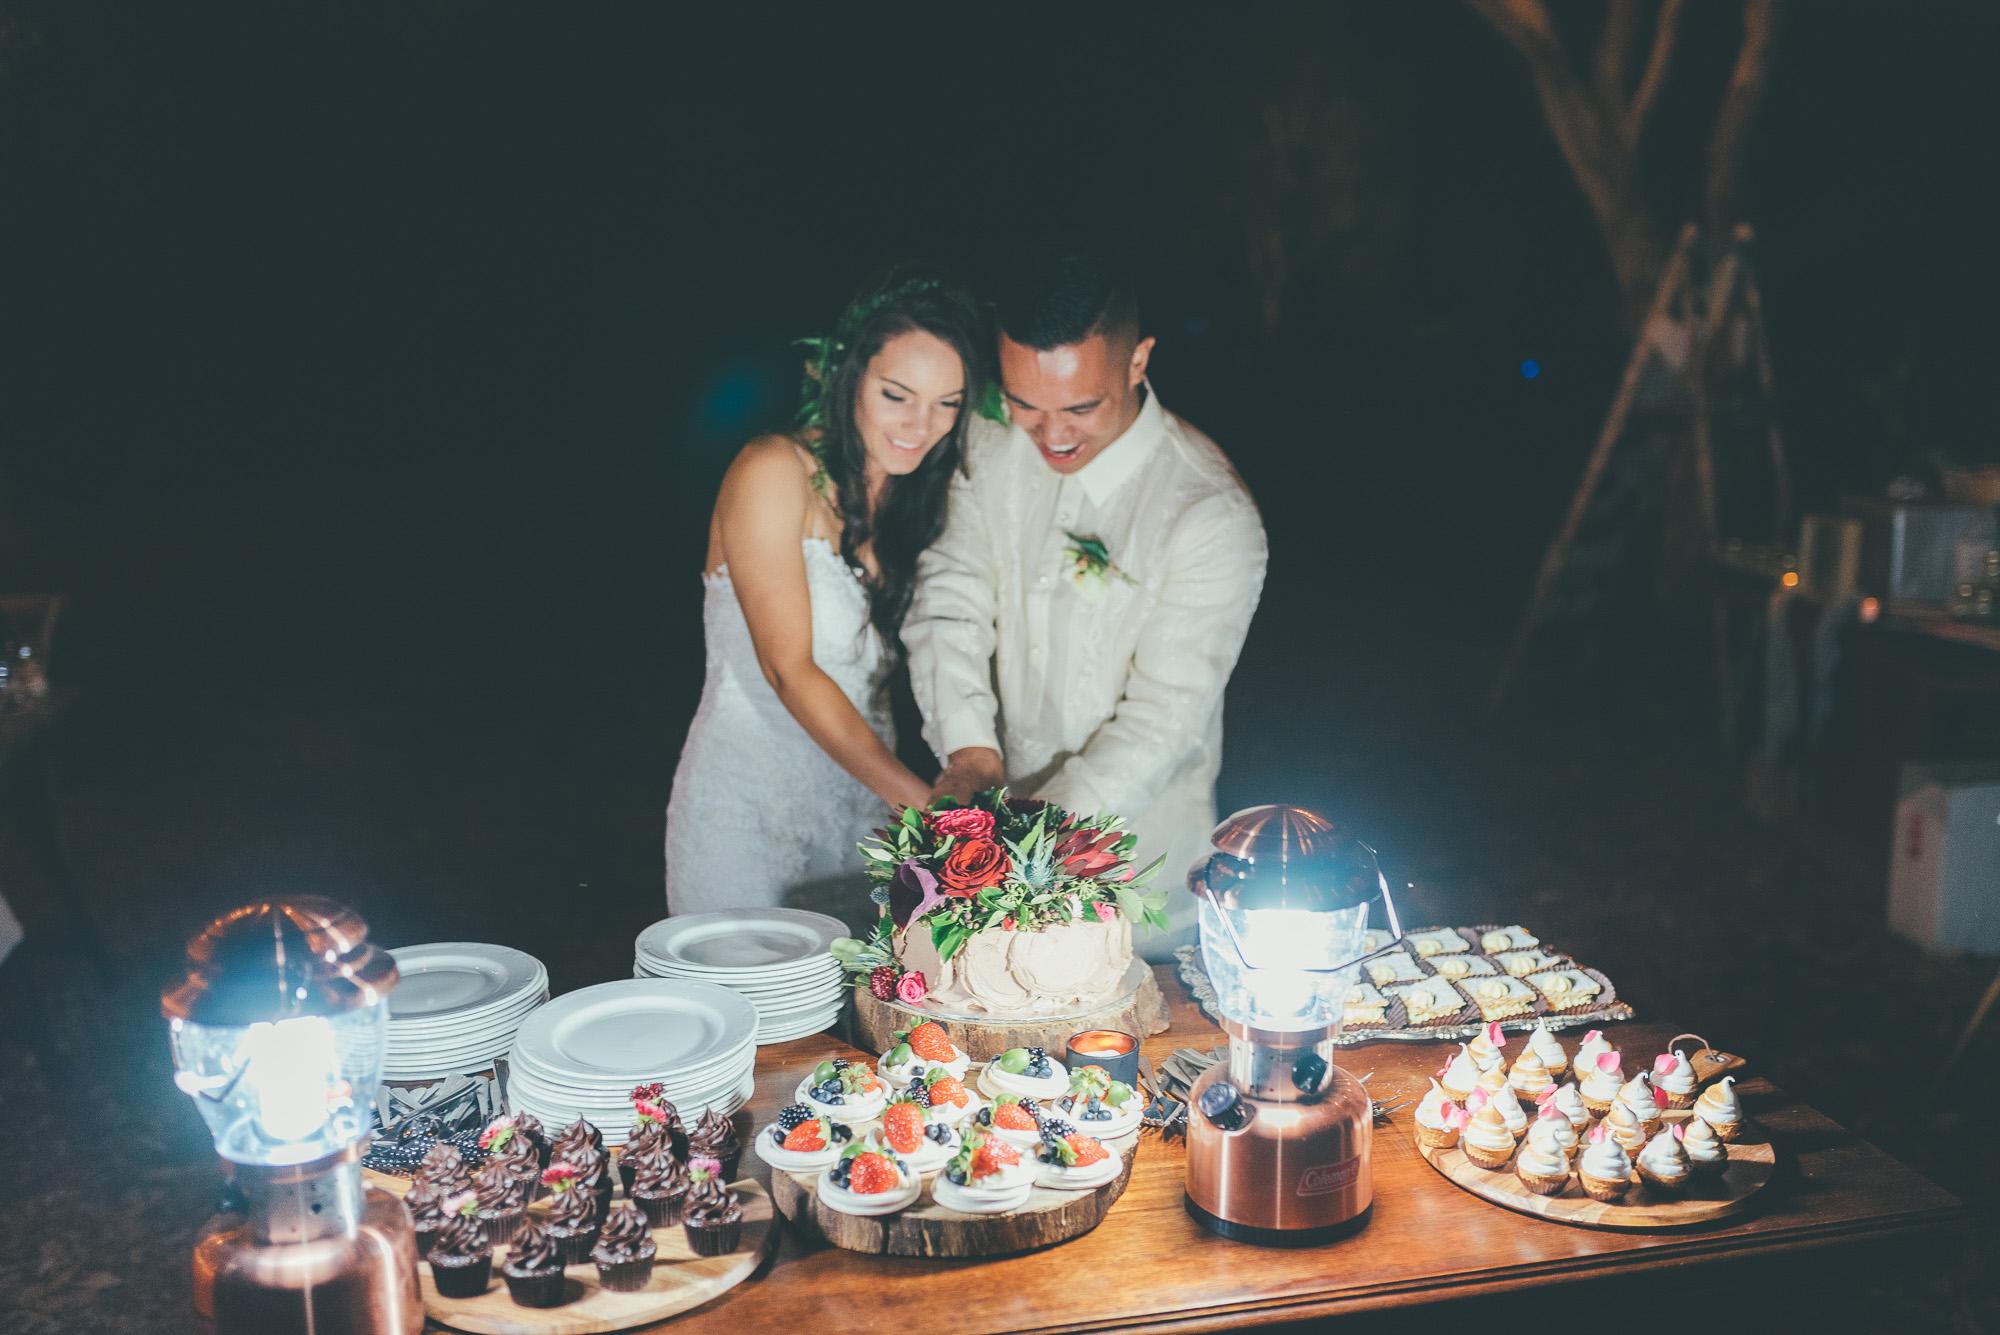 wedding-photographer-outdoor-casual-styled-los-angeles-australia-california-international-earthbound -95.jpg